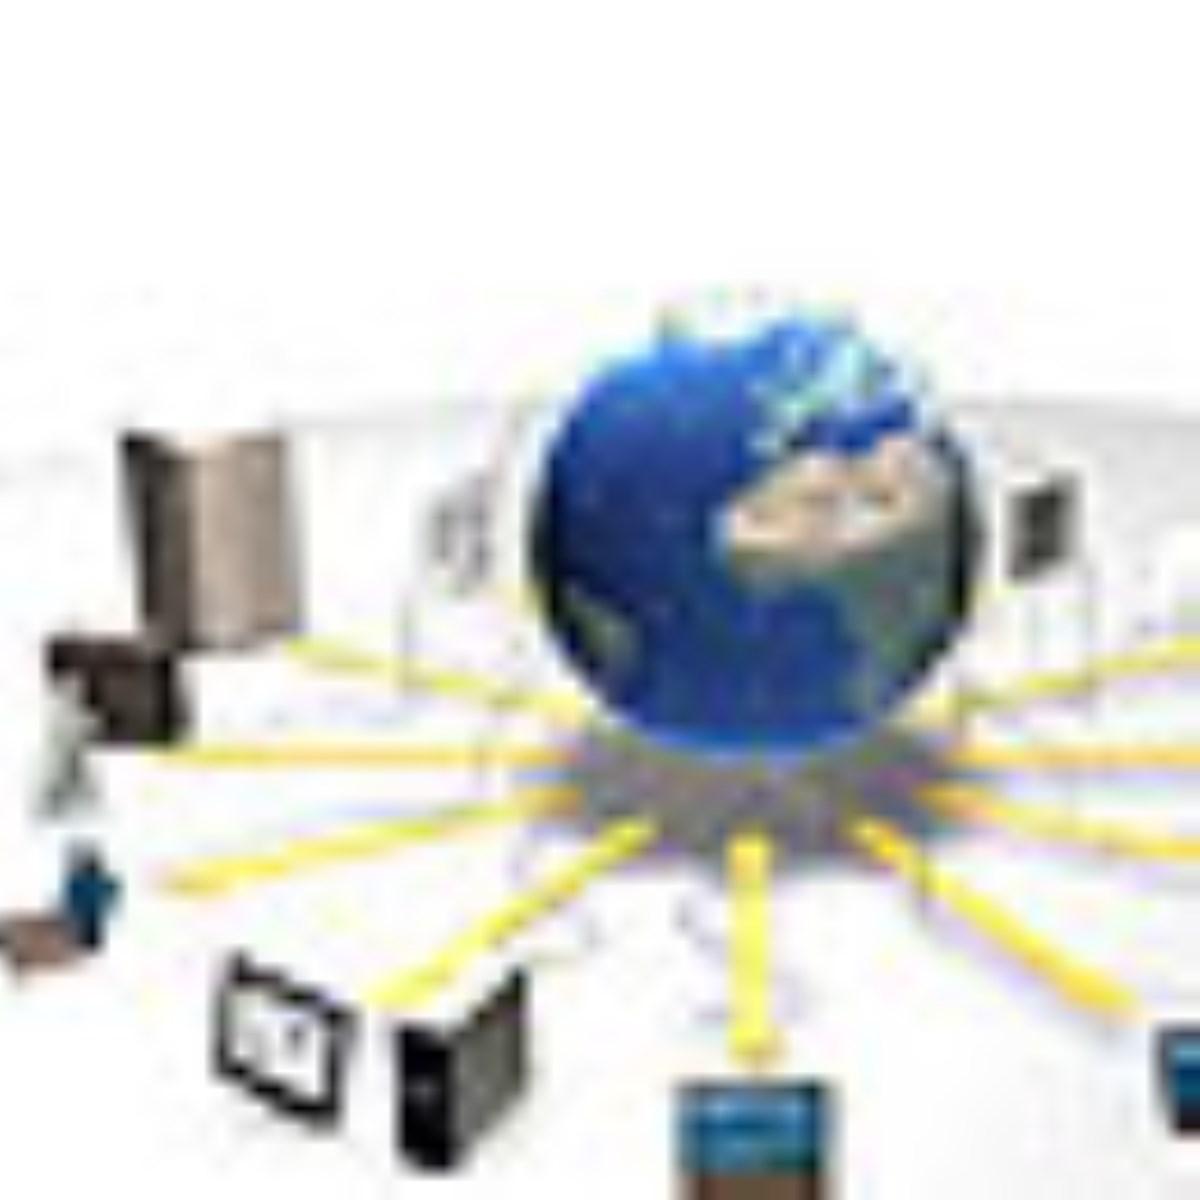 اتصال اينترنت به برق شهر